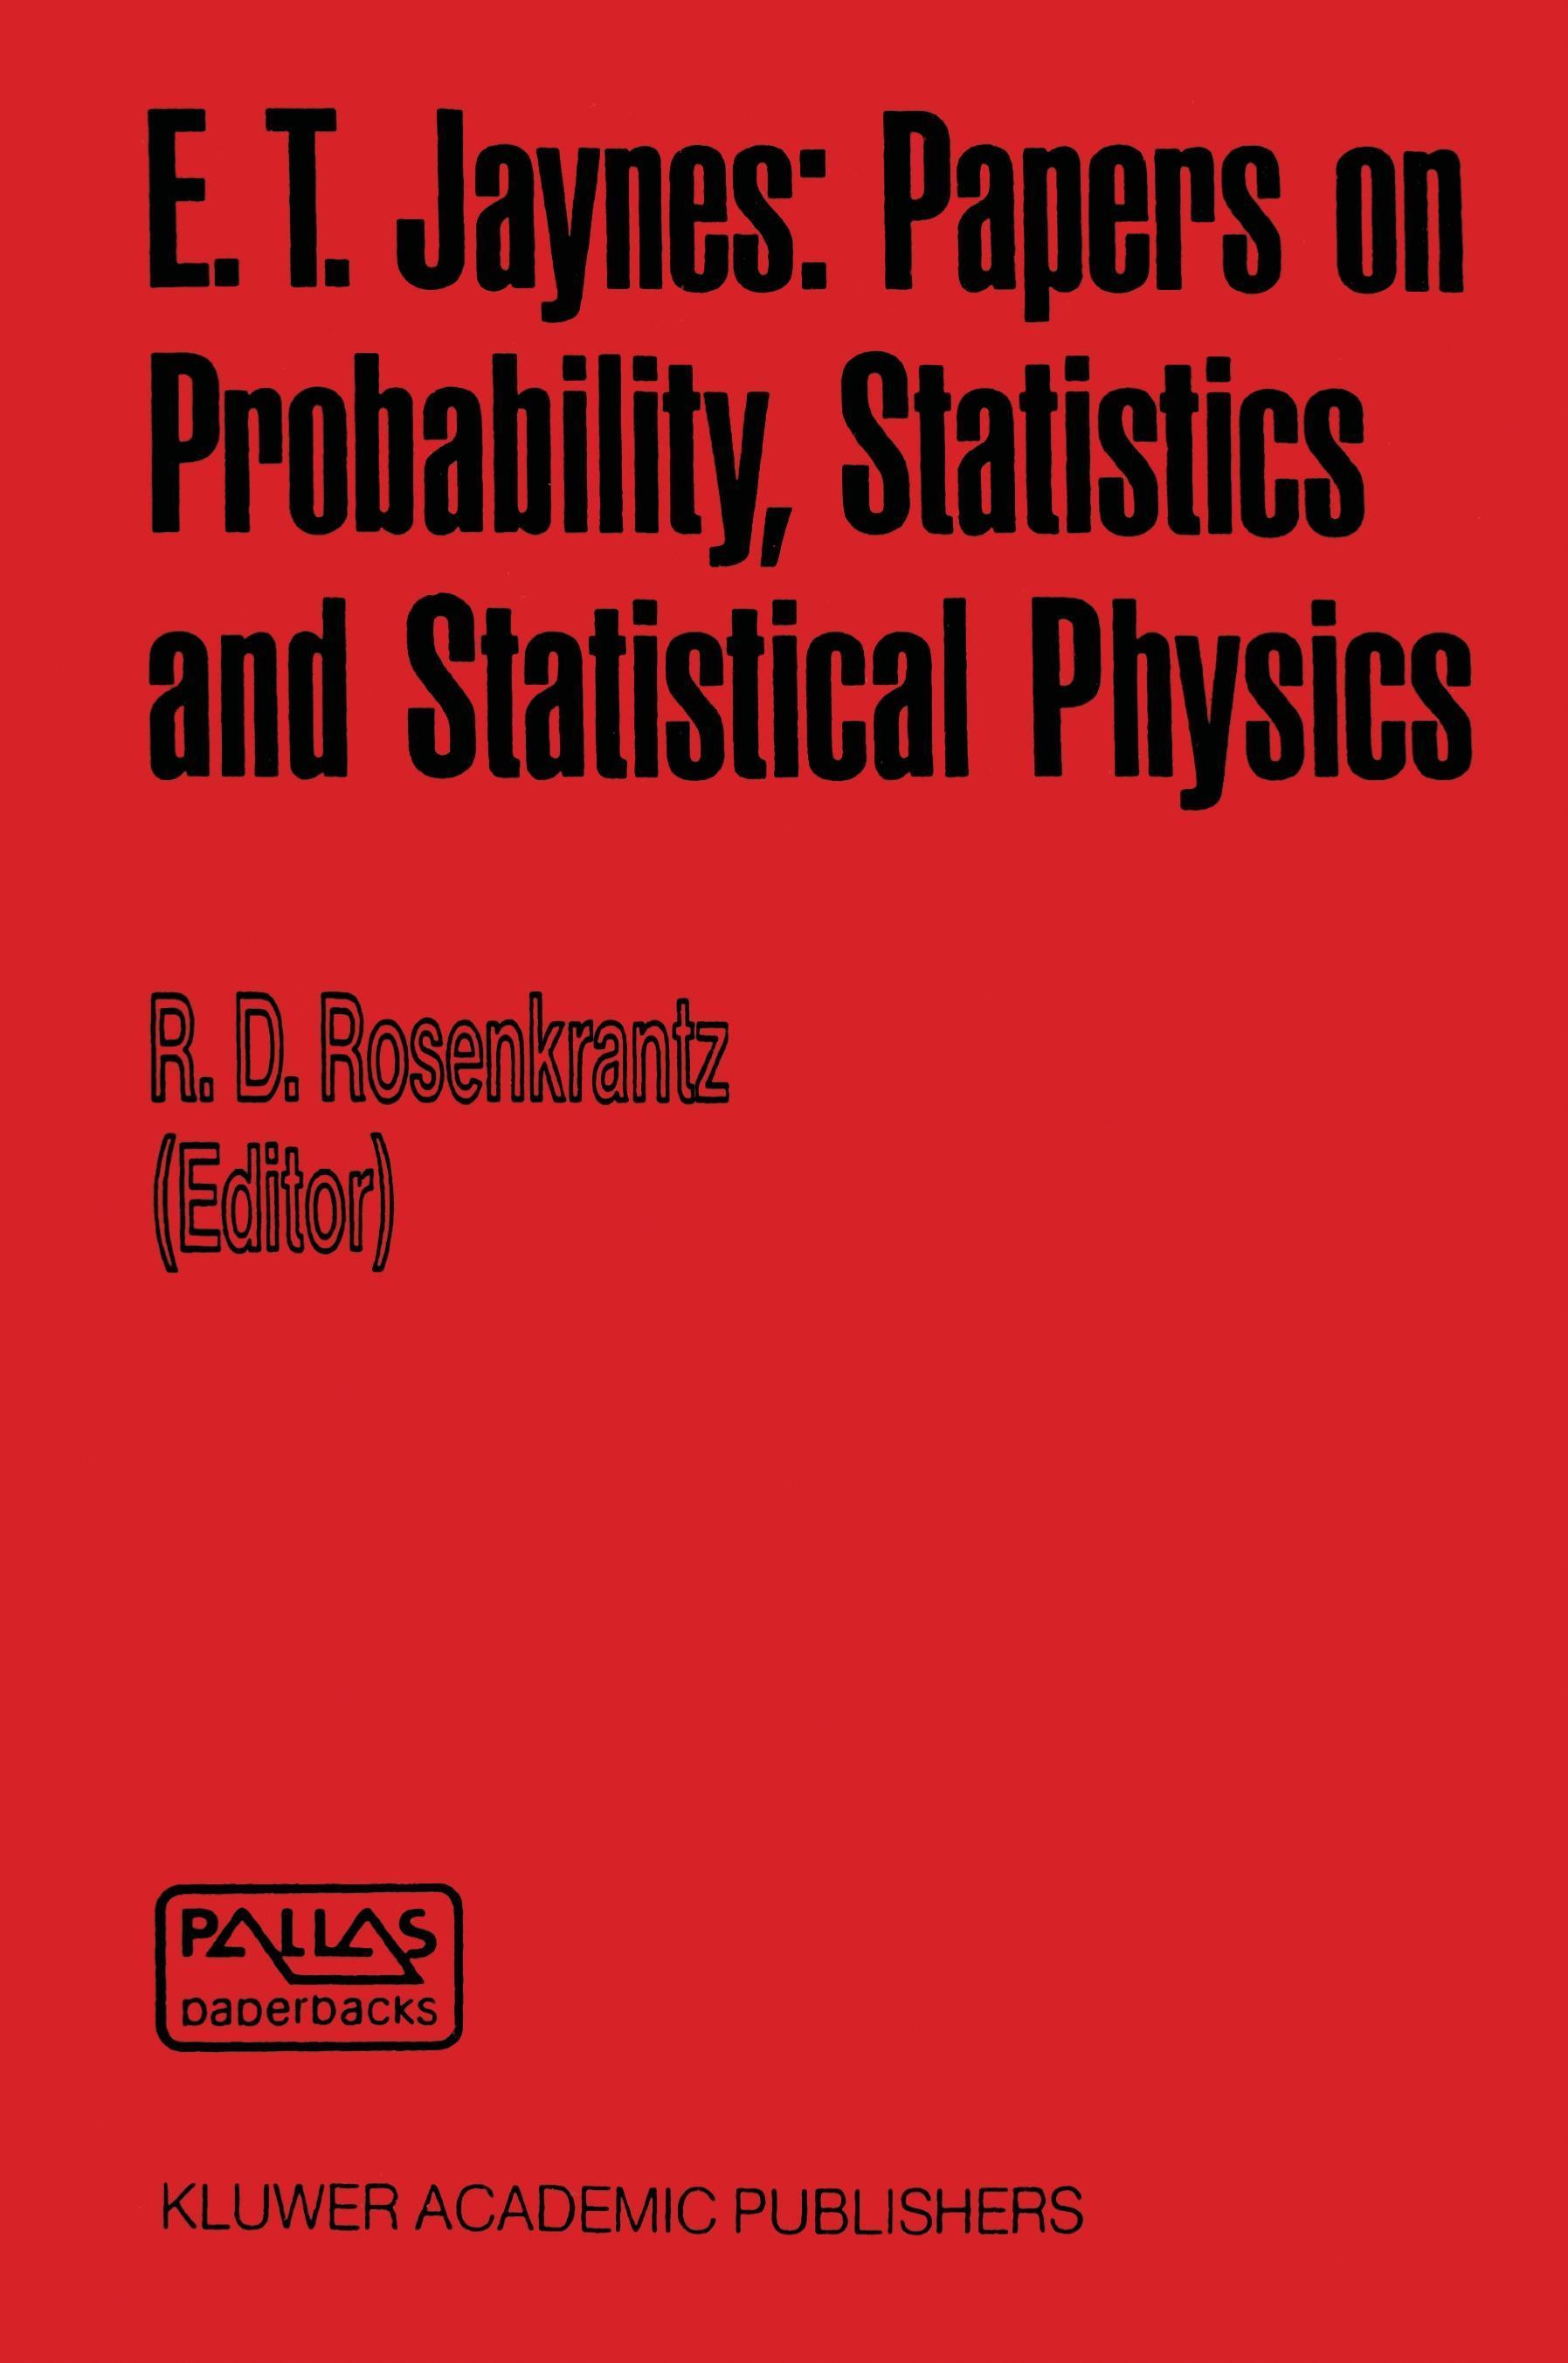 R. D. Rosenkrantz / E. T. Jaynes: Papers on Probability, Sta ... 9780792302131